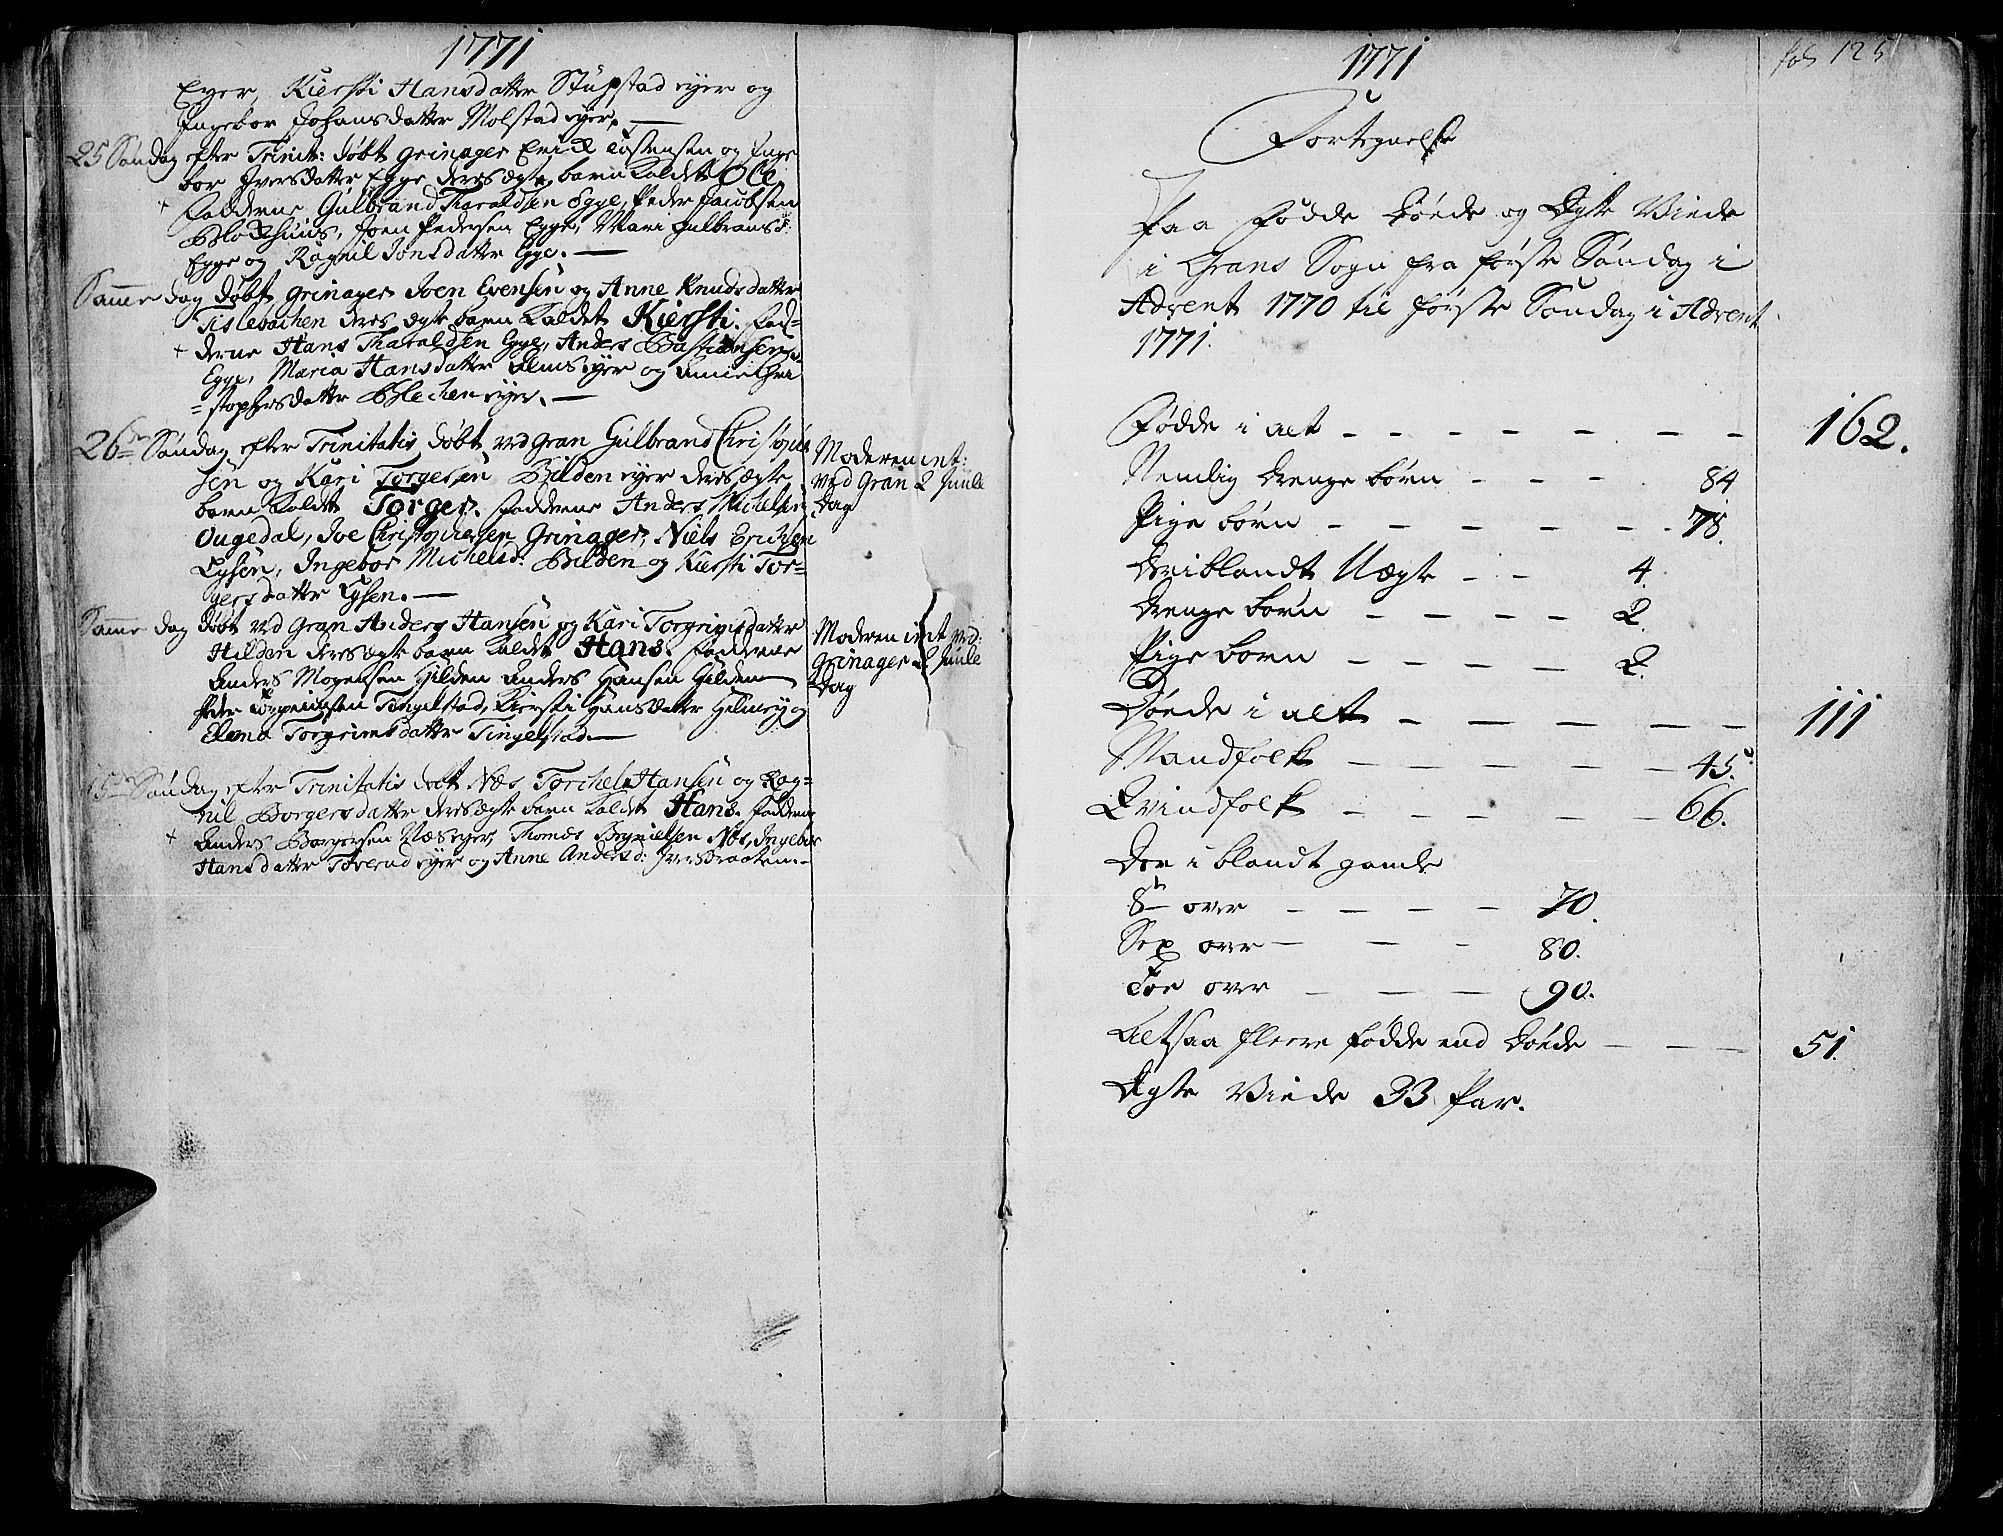 SAH, Gran prestekontor, Ministerialbok nr. 4, 1759-1775, s. 125